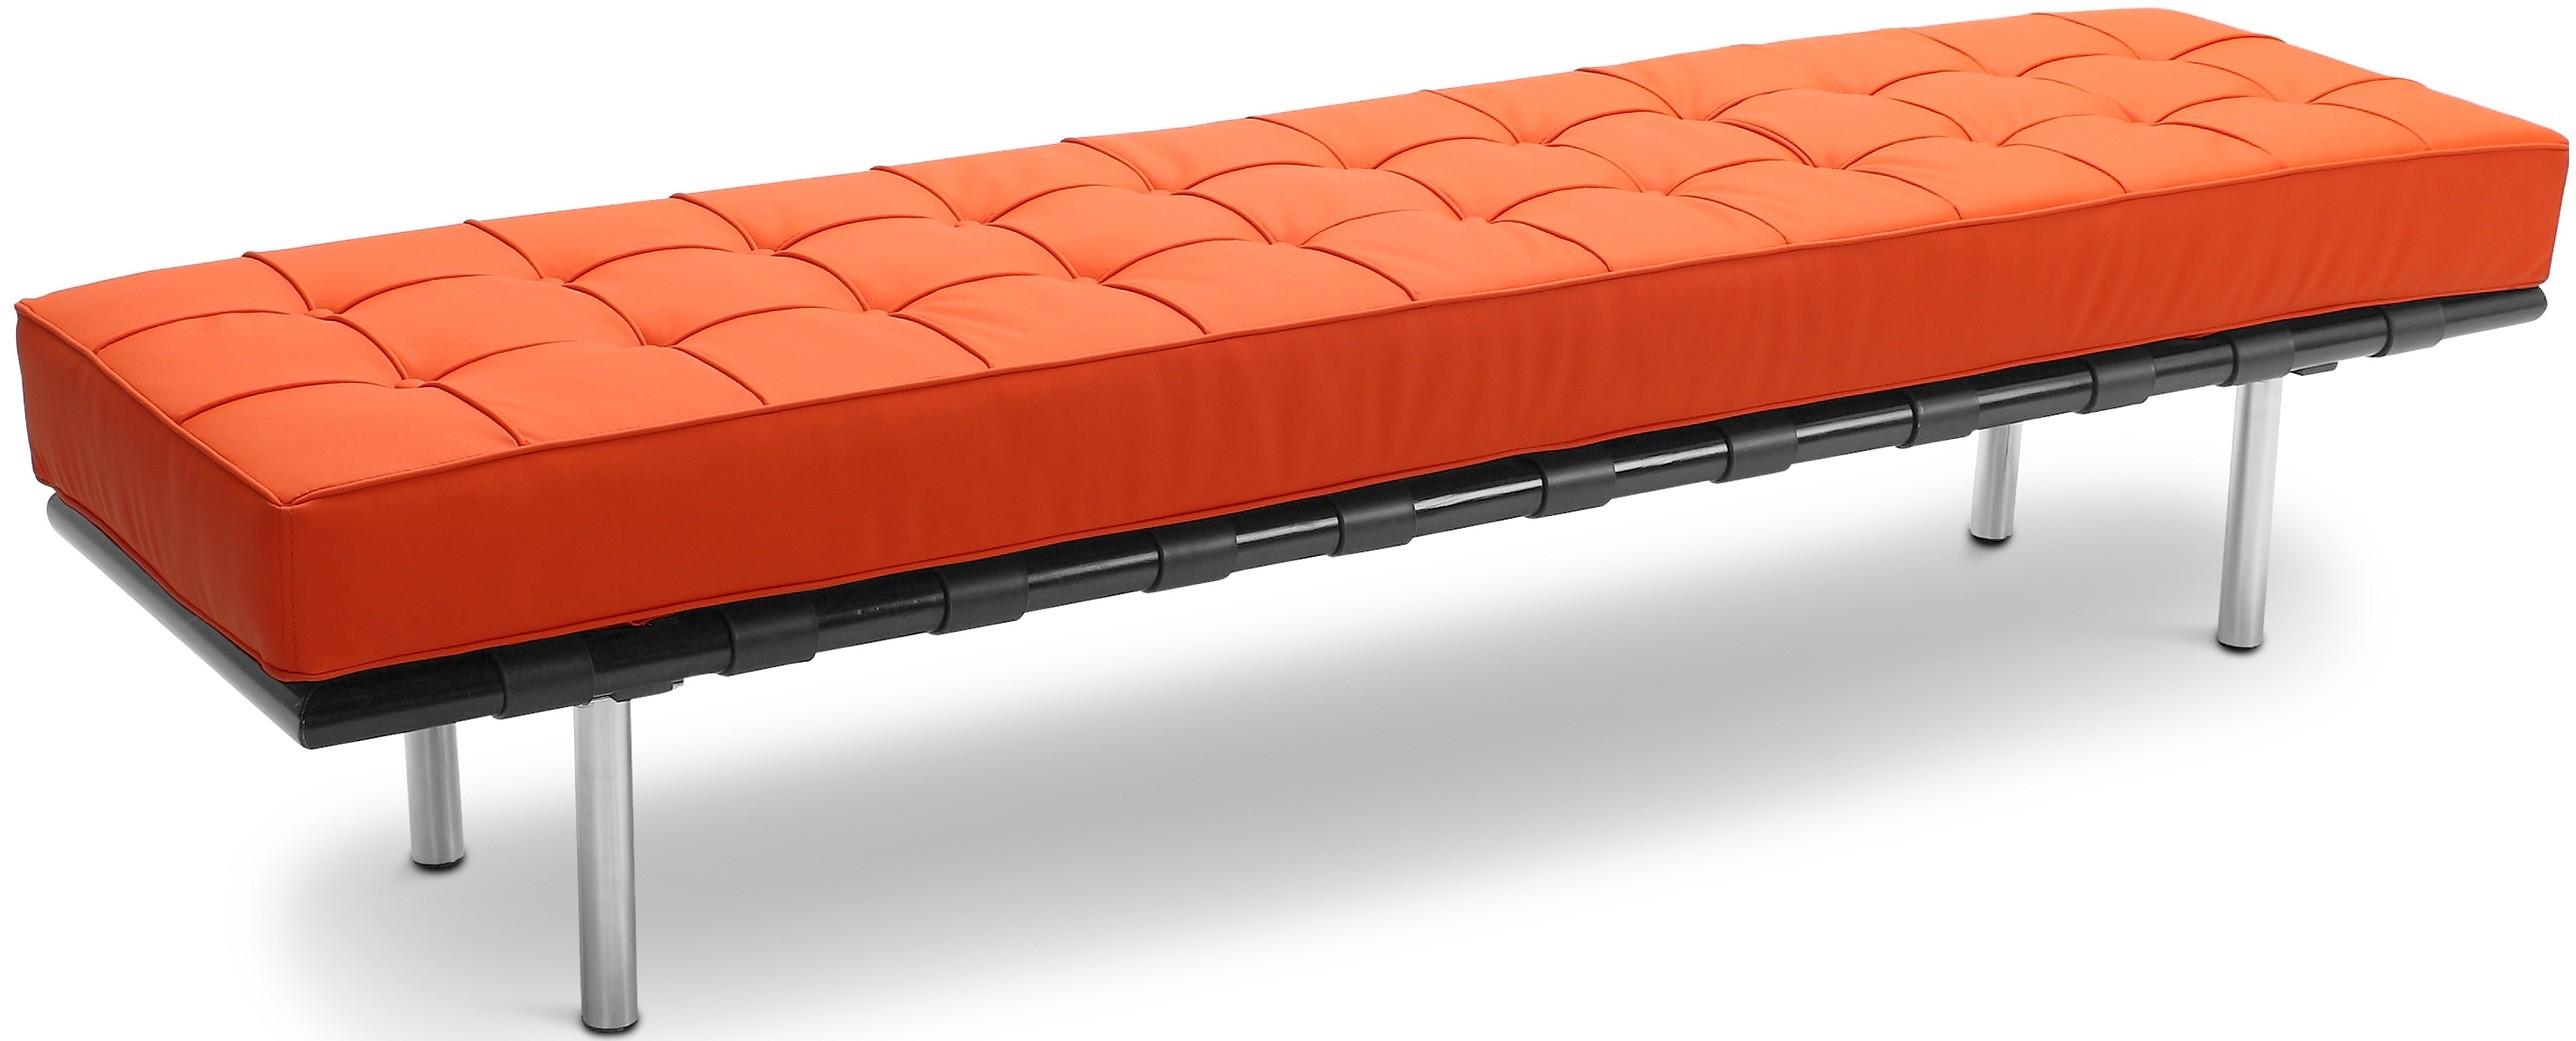 banc 3 places simili orange barca inspir ludwig mies van der rohe. Black Bedroom Furniture Sets. Home Design Ideas